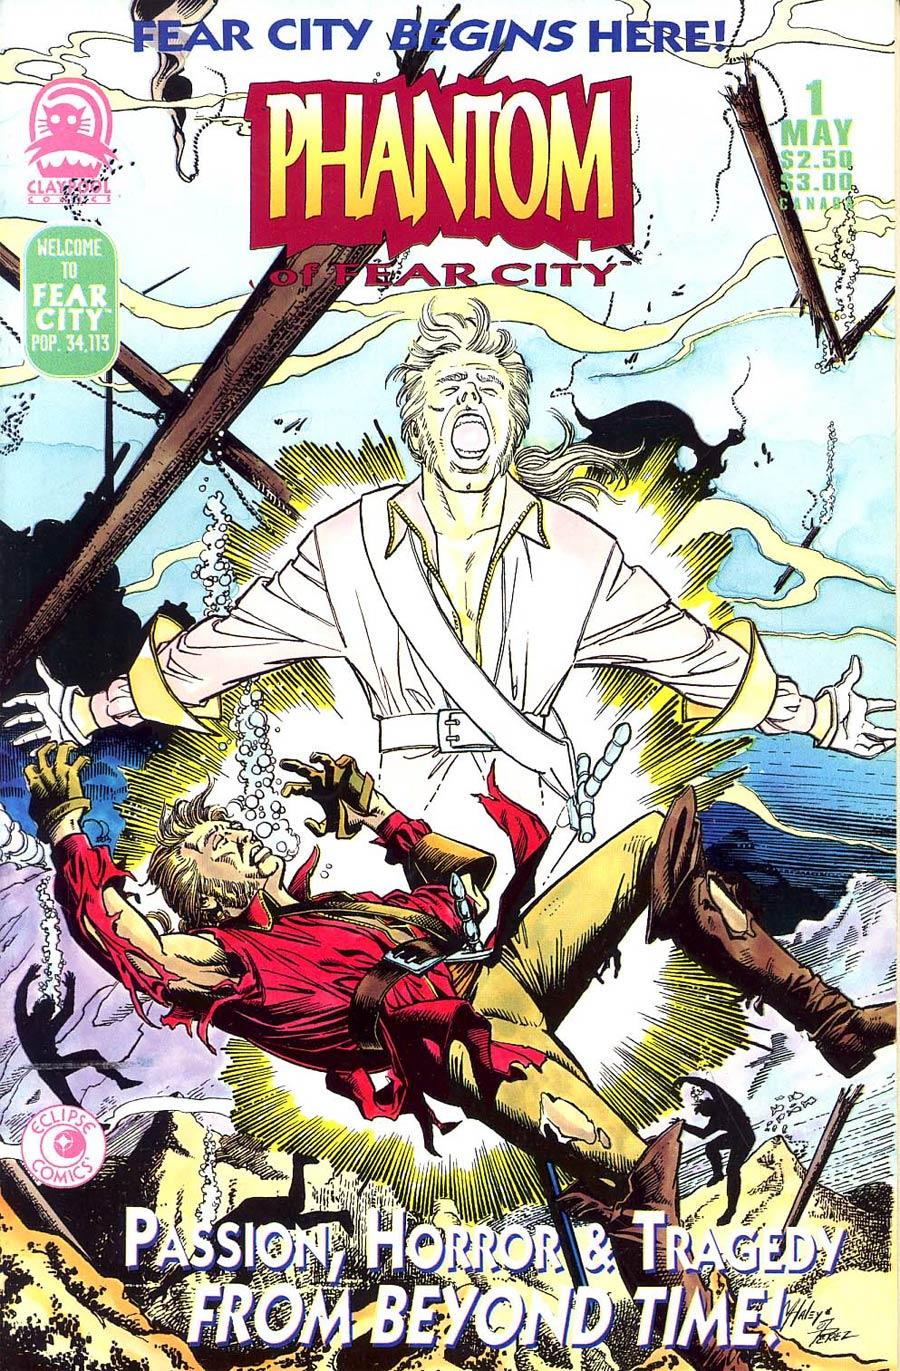 Phantom of Fear City #1